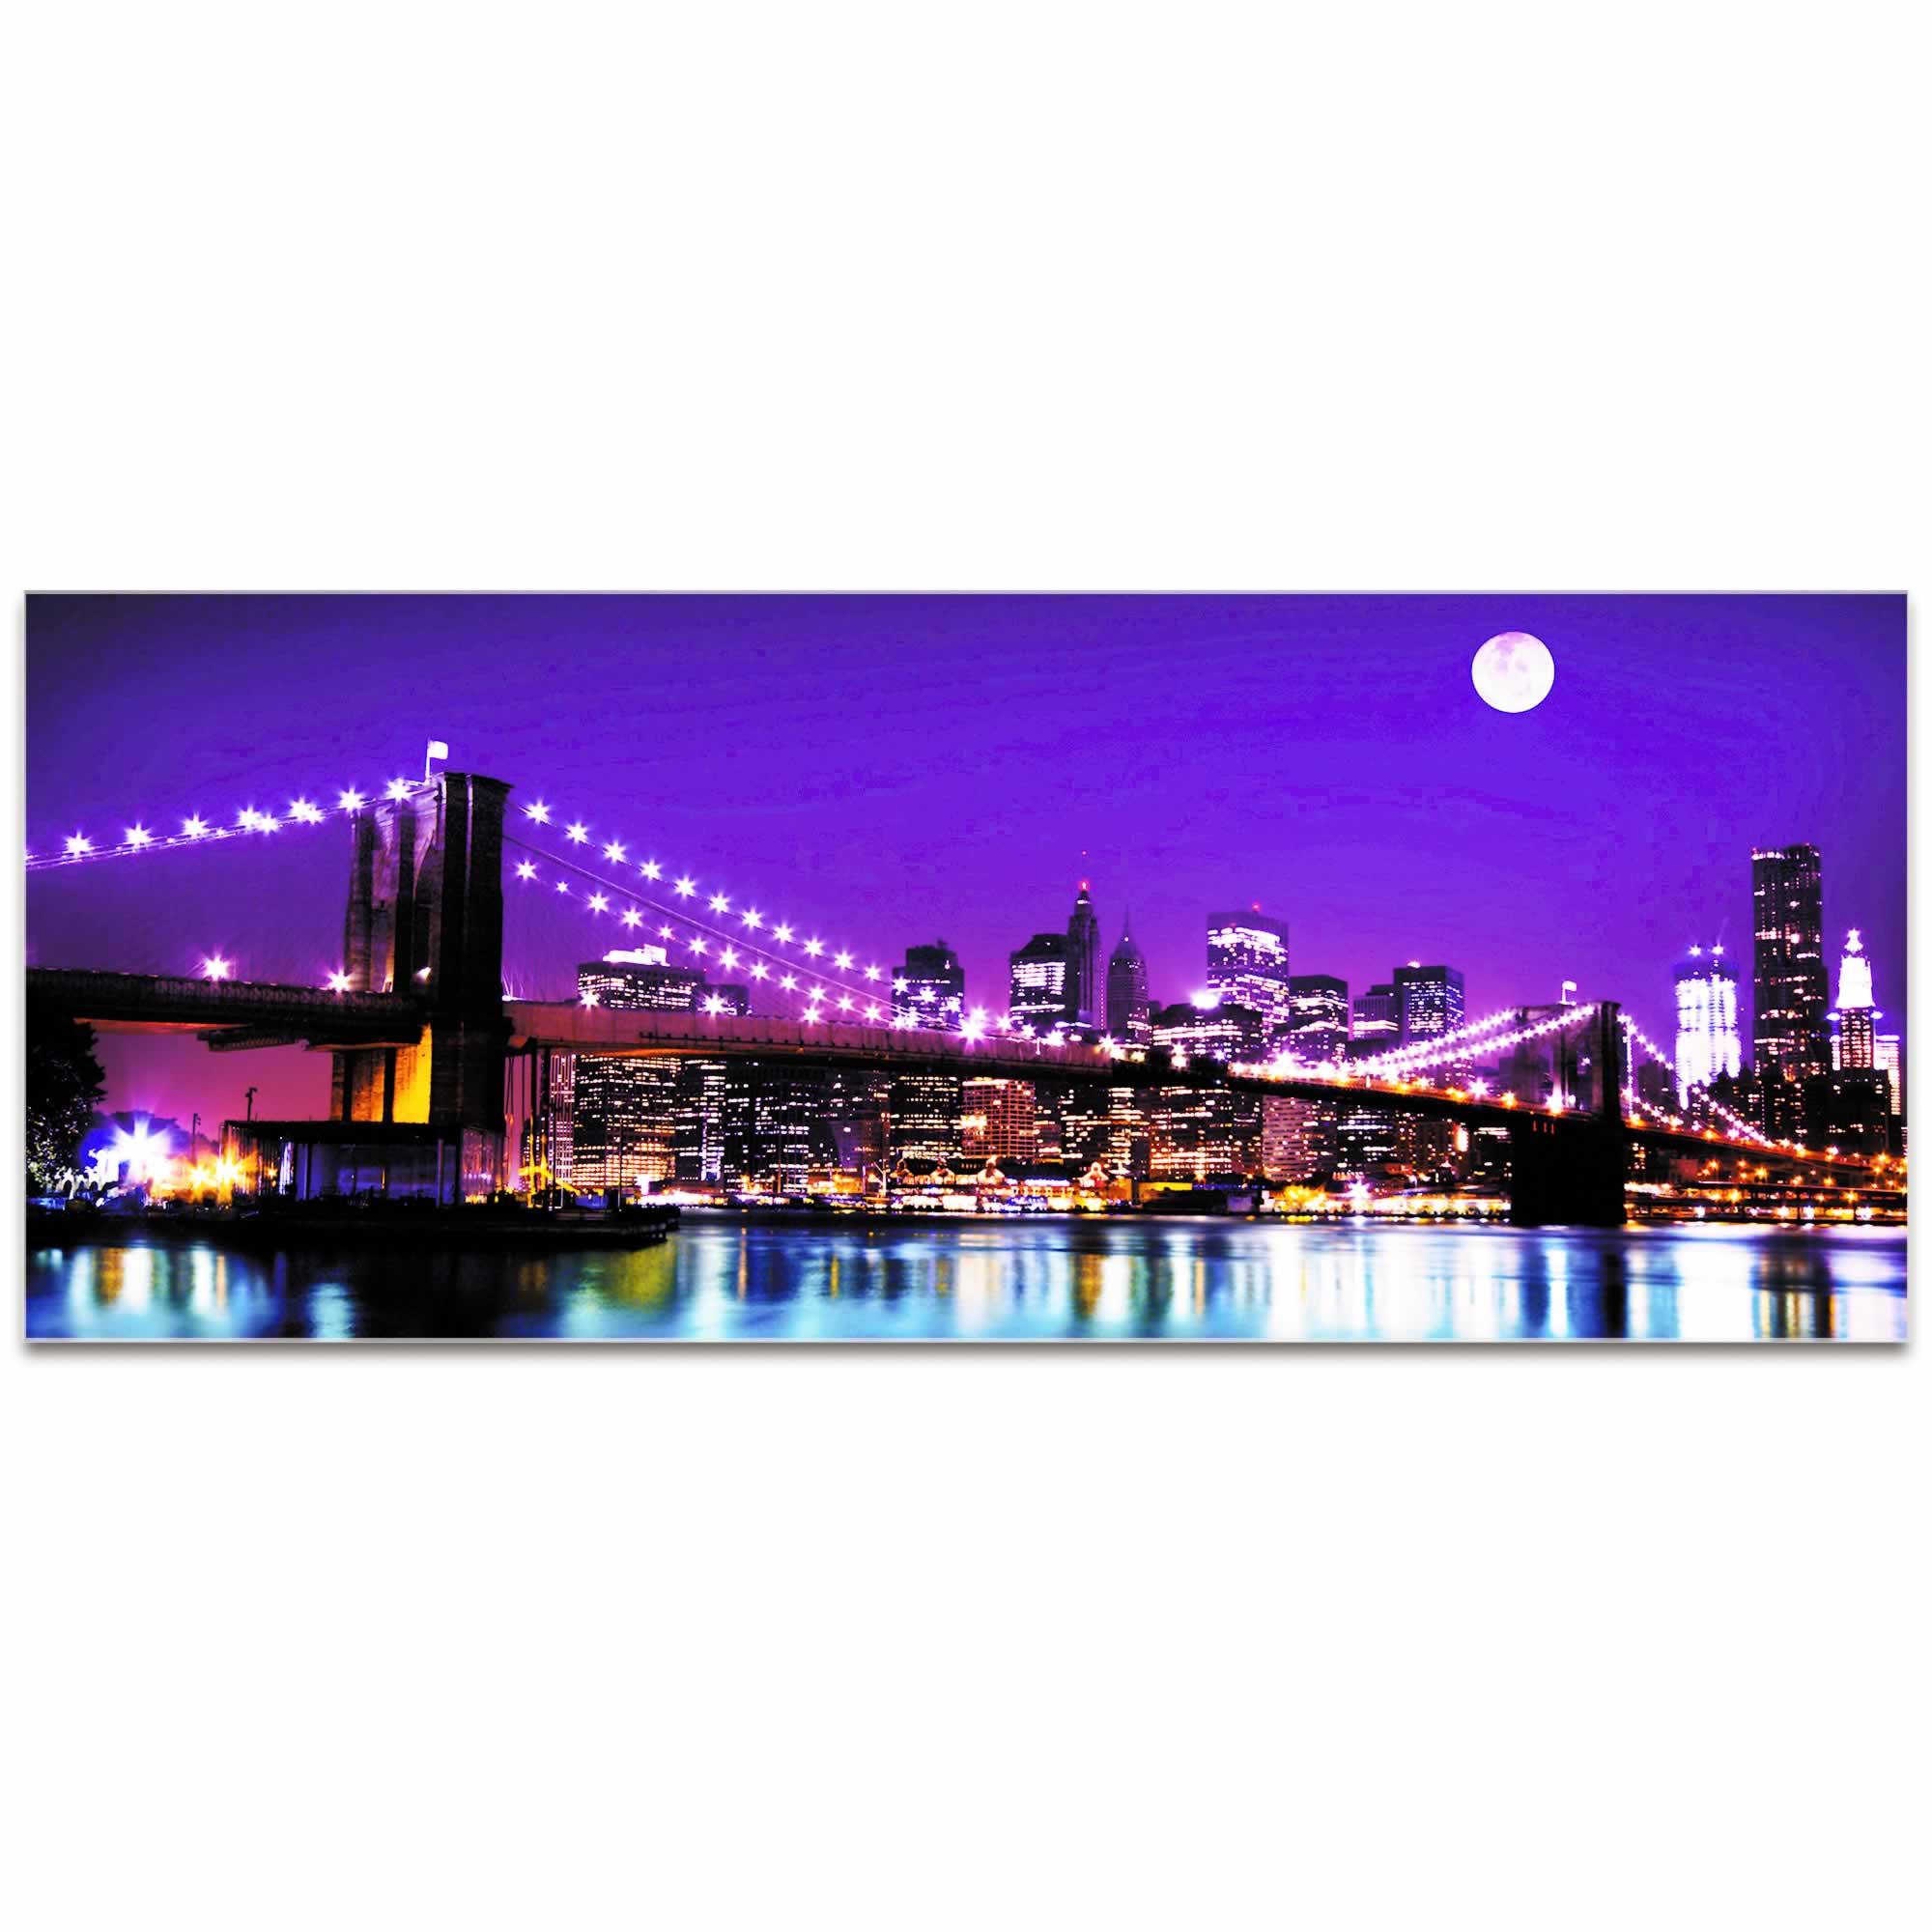 New York Bridge City Skyline - Urban Modern Art, Designer Home Decor, Cityscape Wall Artwork, Trendy Contemporary Art